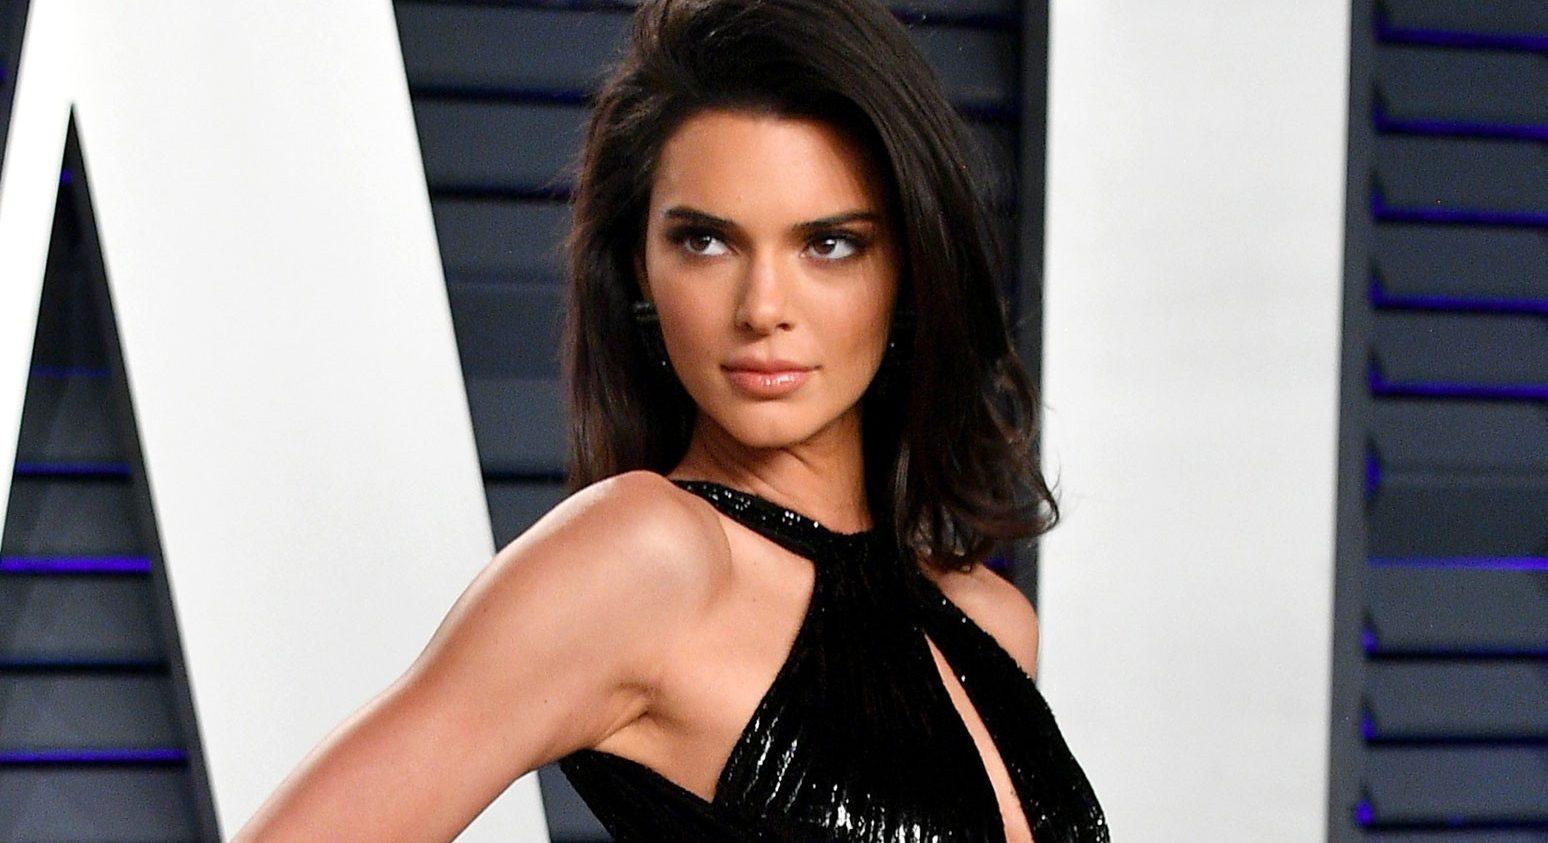 Kendall Jenner: Πού το βρήκε άραγε αυτό το φανταστικό κοτλέ παντελόνι; Μπορεί εμείς να παραμένουμε κλεισμένοι στο σπίτι μας, η Kendall Jenner ωστόσο έχει ήδη ξεκινήσει τις εξορμήσεις εκτός πόλης τα weekends, με τα casual outfits της να μην περνούν ποτέ απαρατήρητα.